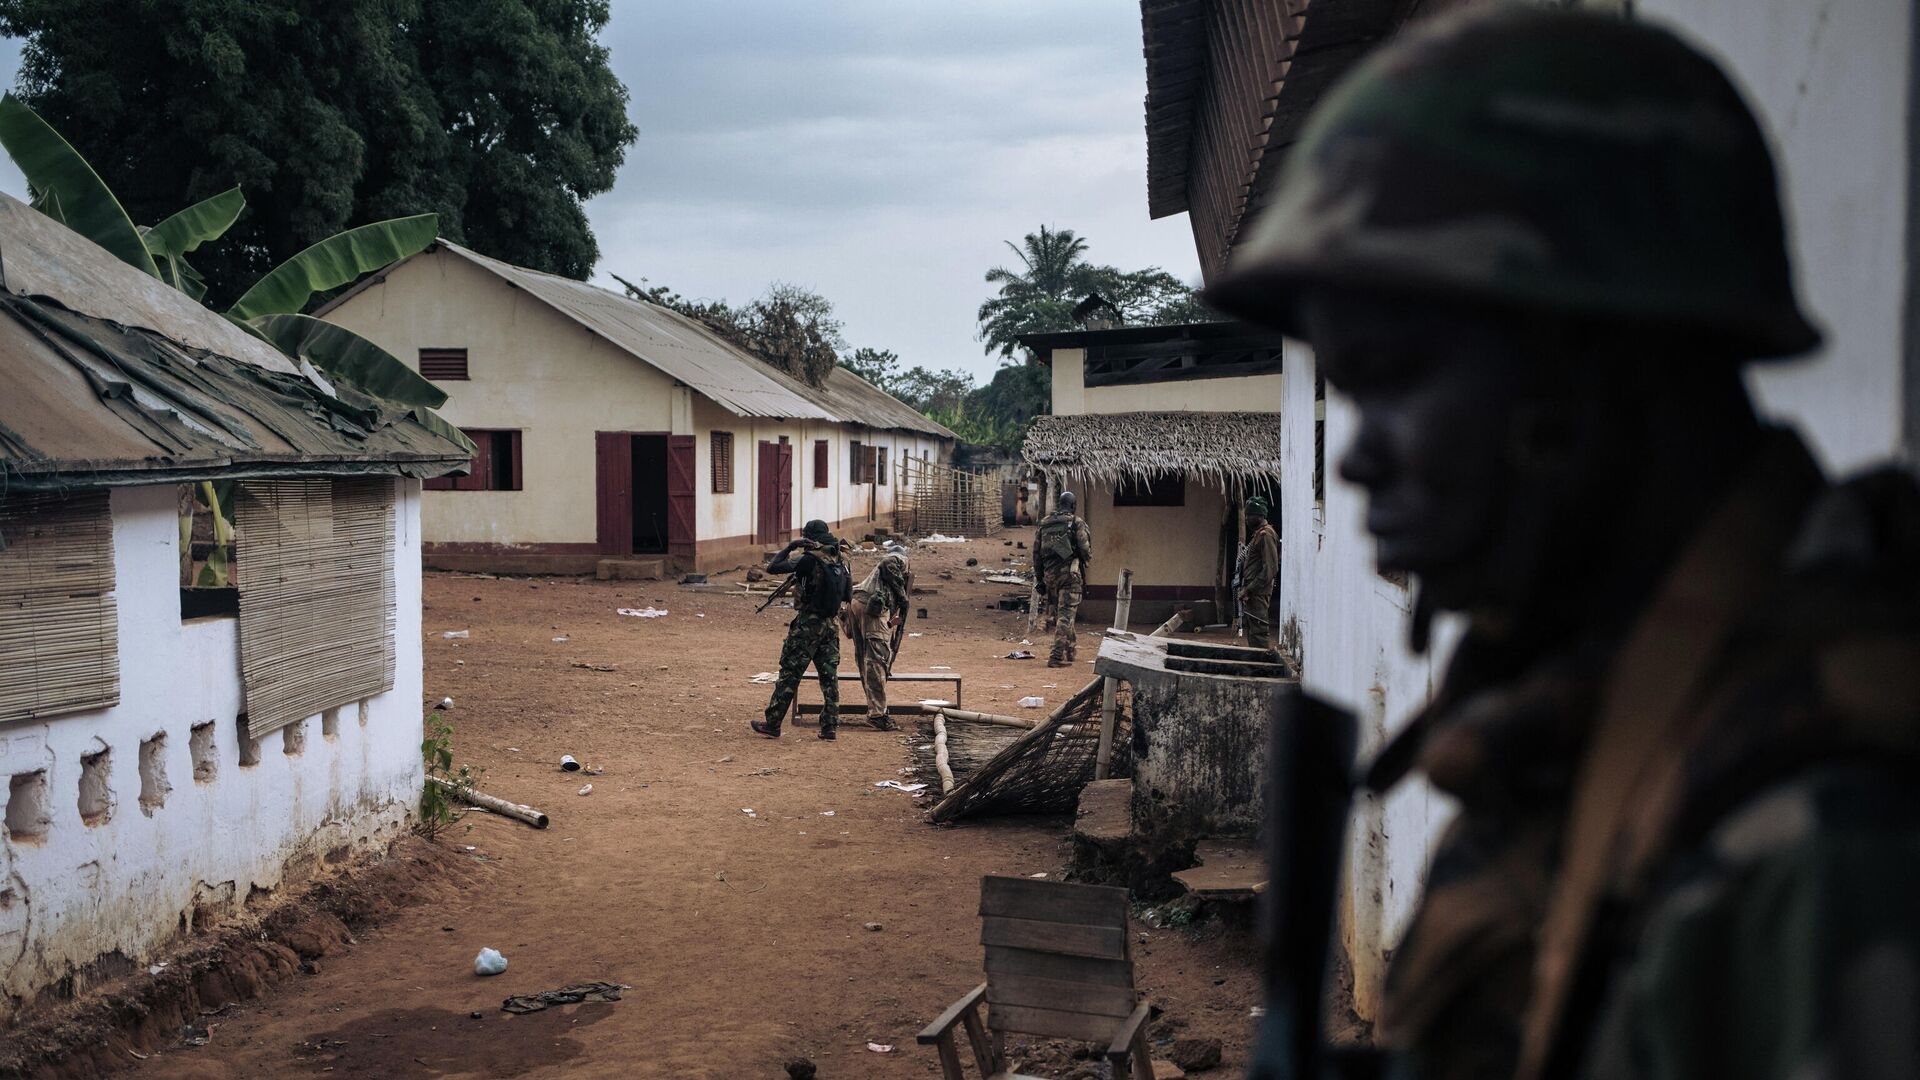 Militares en la República Centroafricana - Sputnik Mundo, 1920, 06.10.2021